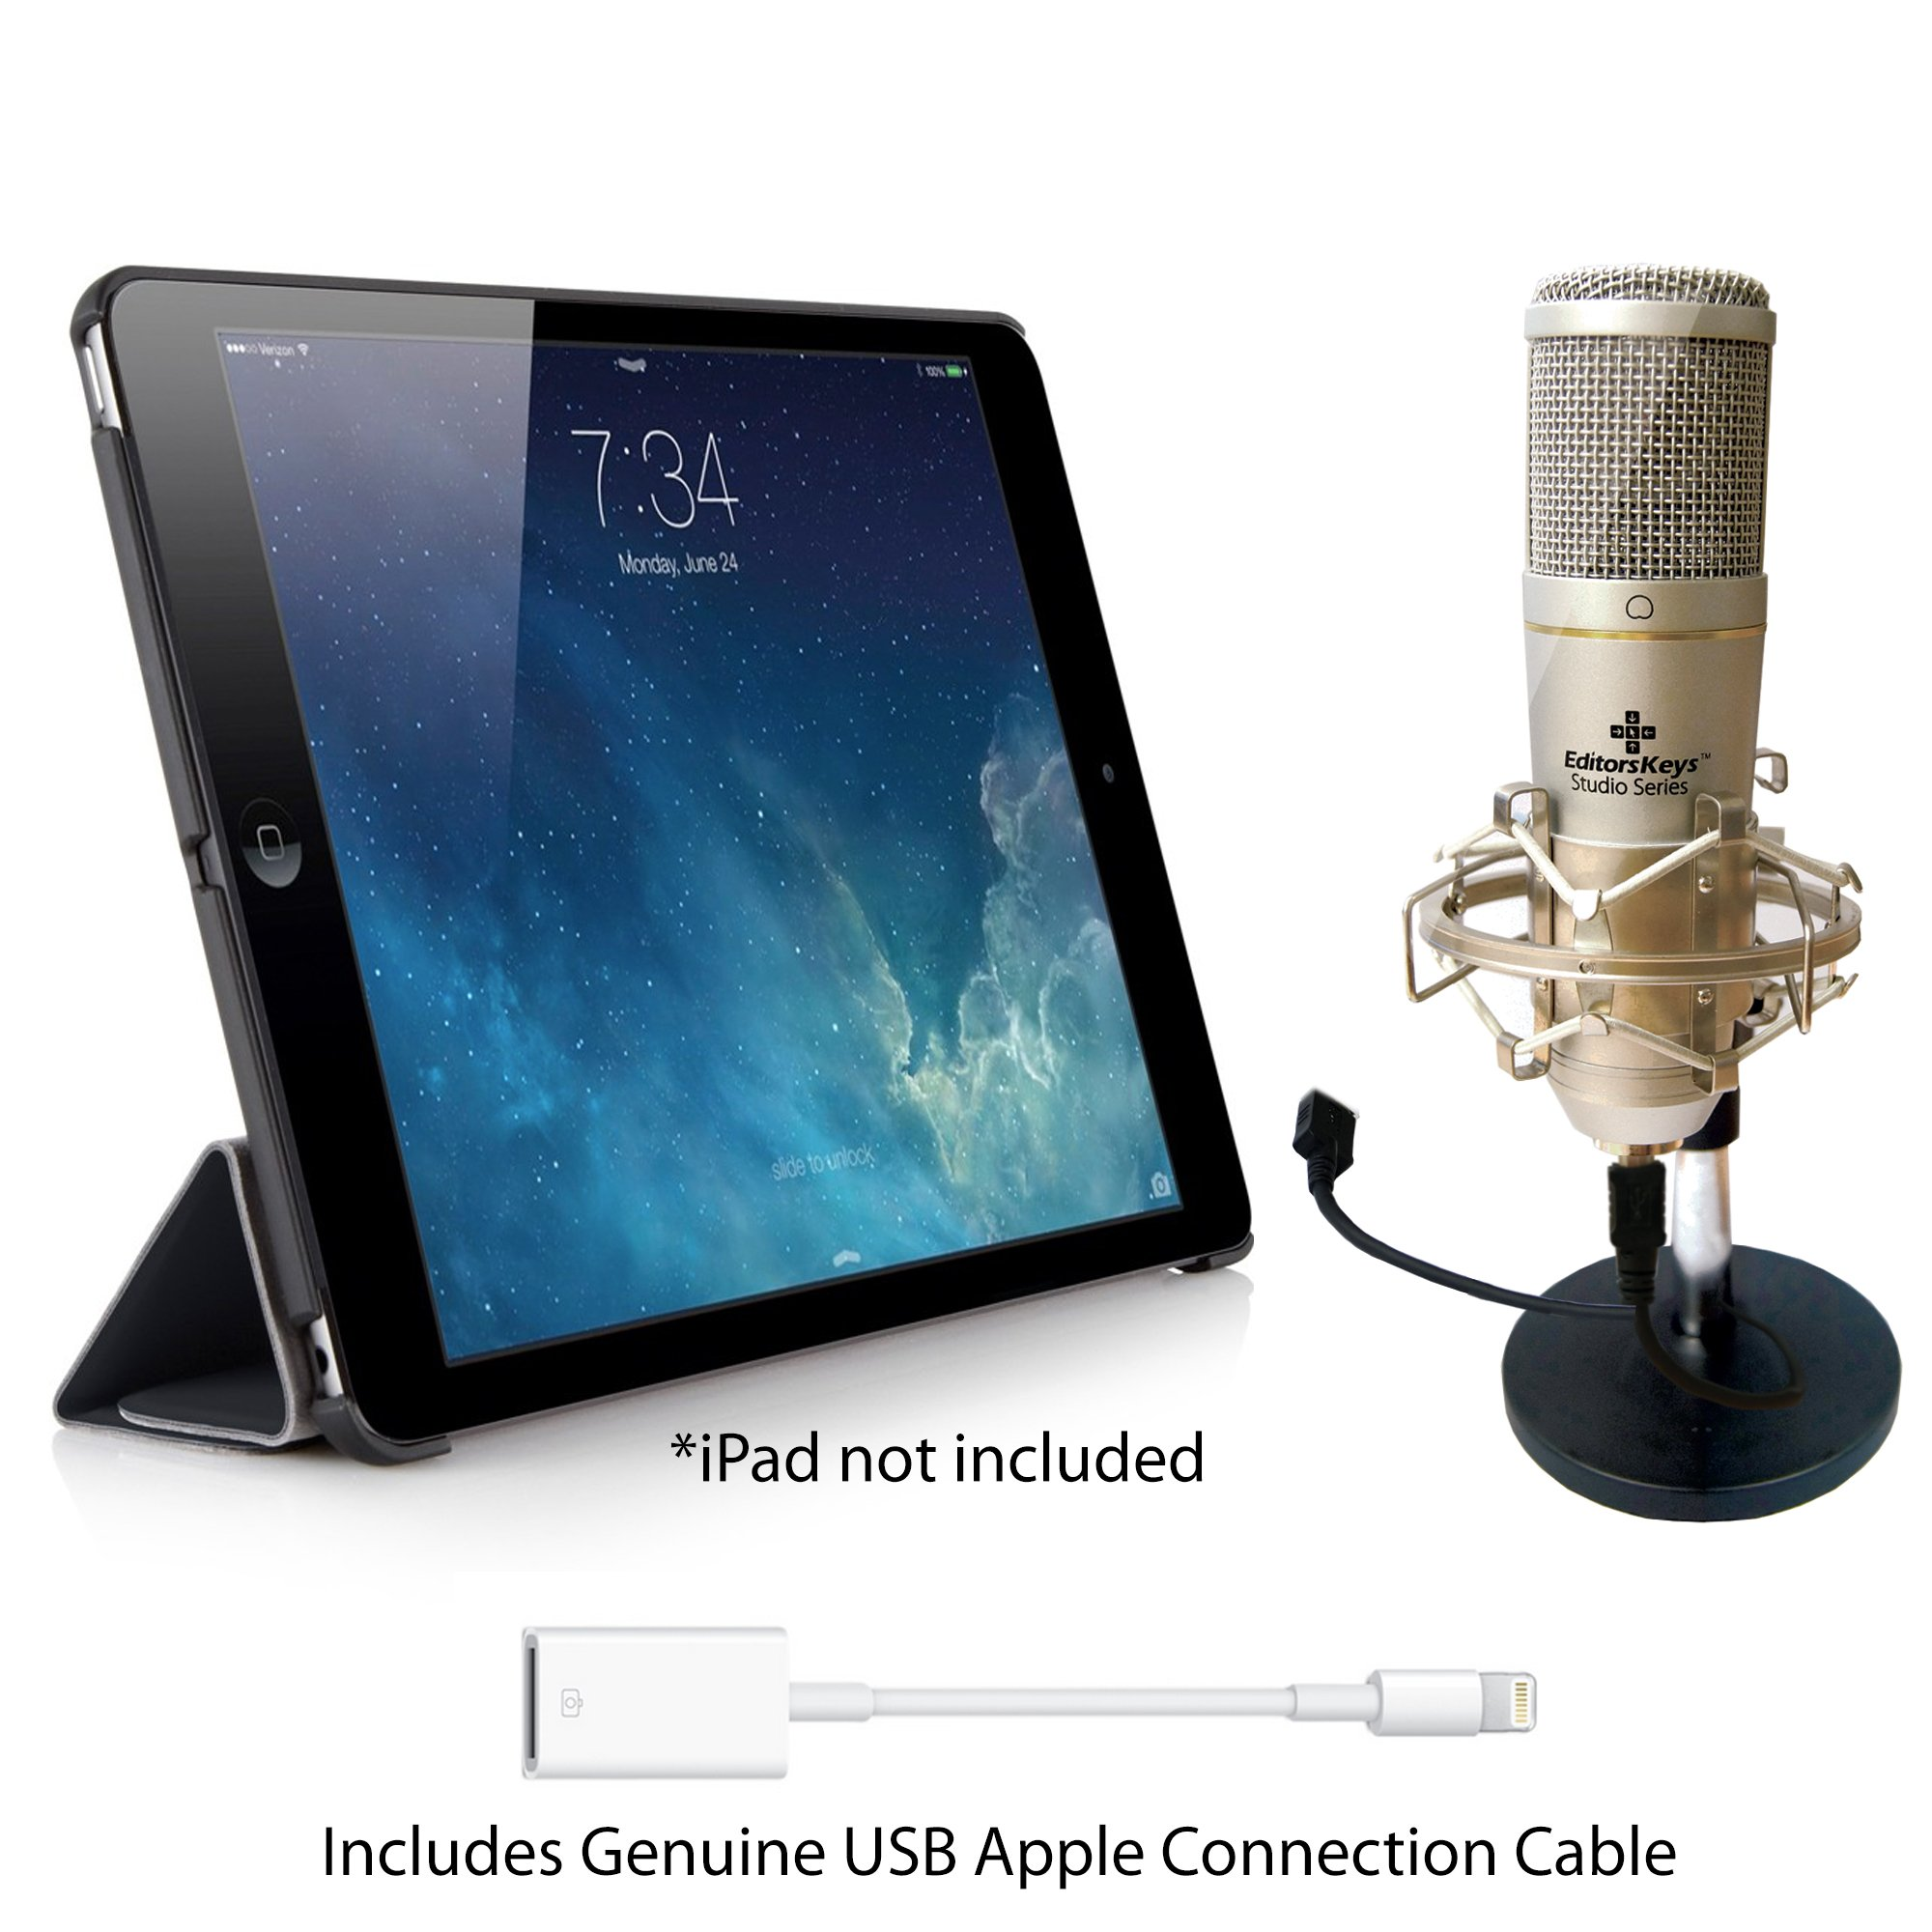 ipad air microphone ipad mini microphone new ipad 3 microphone editors keys. Black Bedroom Furniture Sets. Home Design Ideas